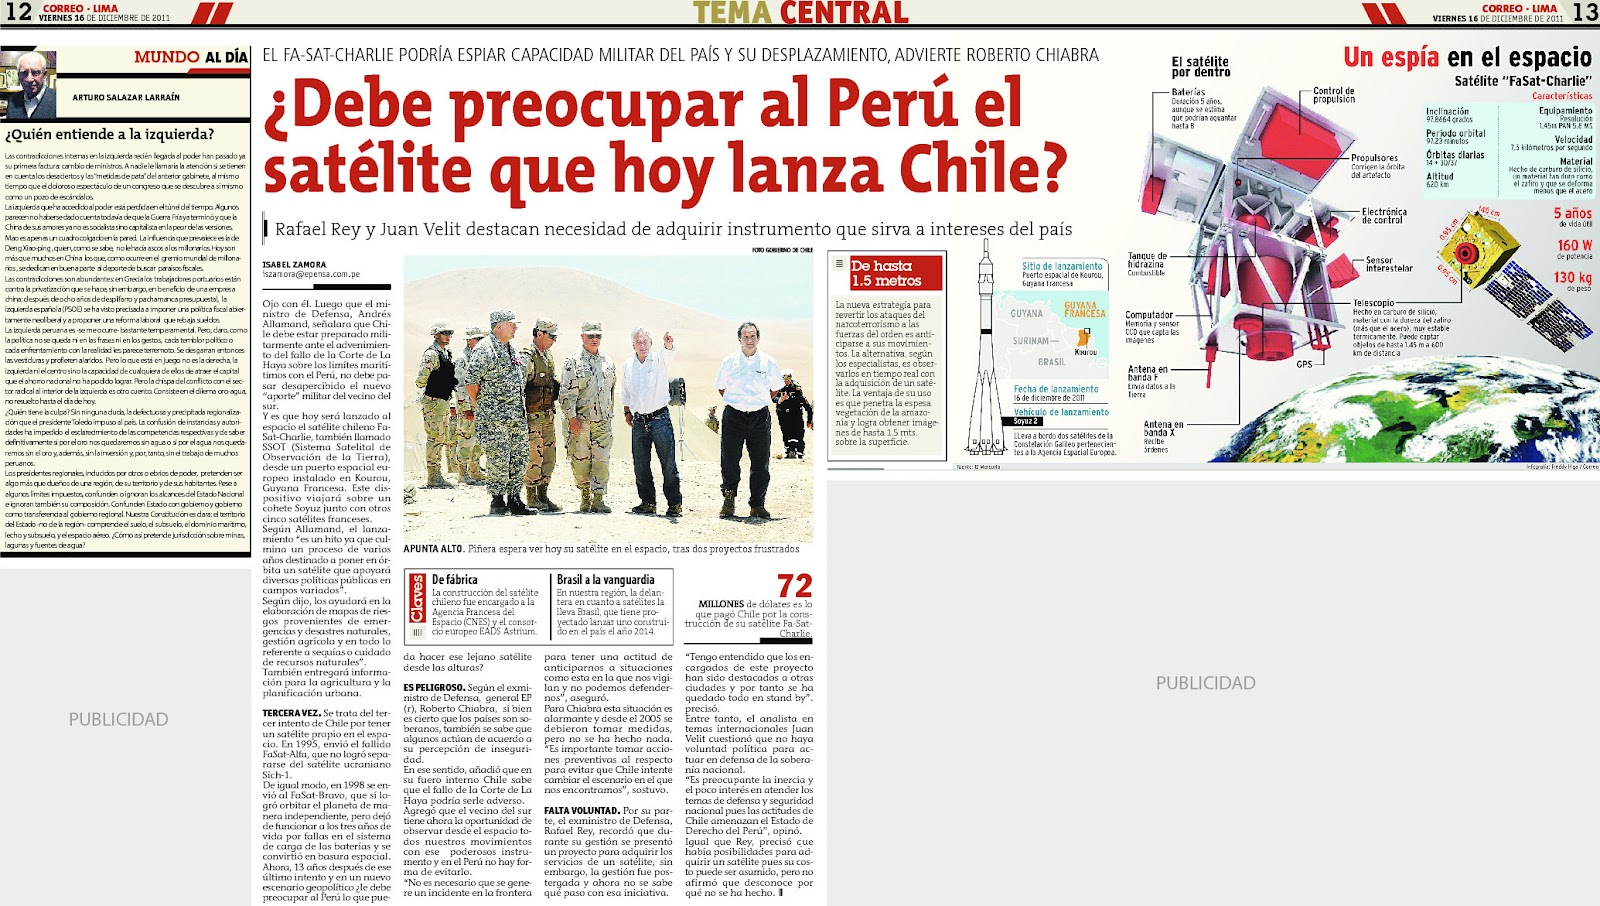 Resultado de imagen para satelite chileno peru